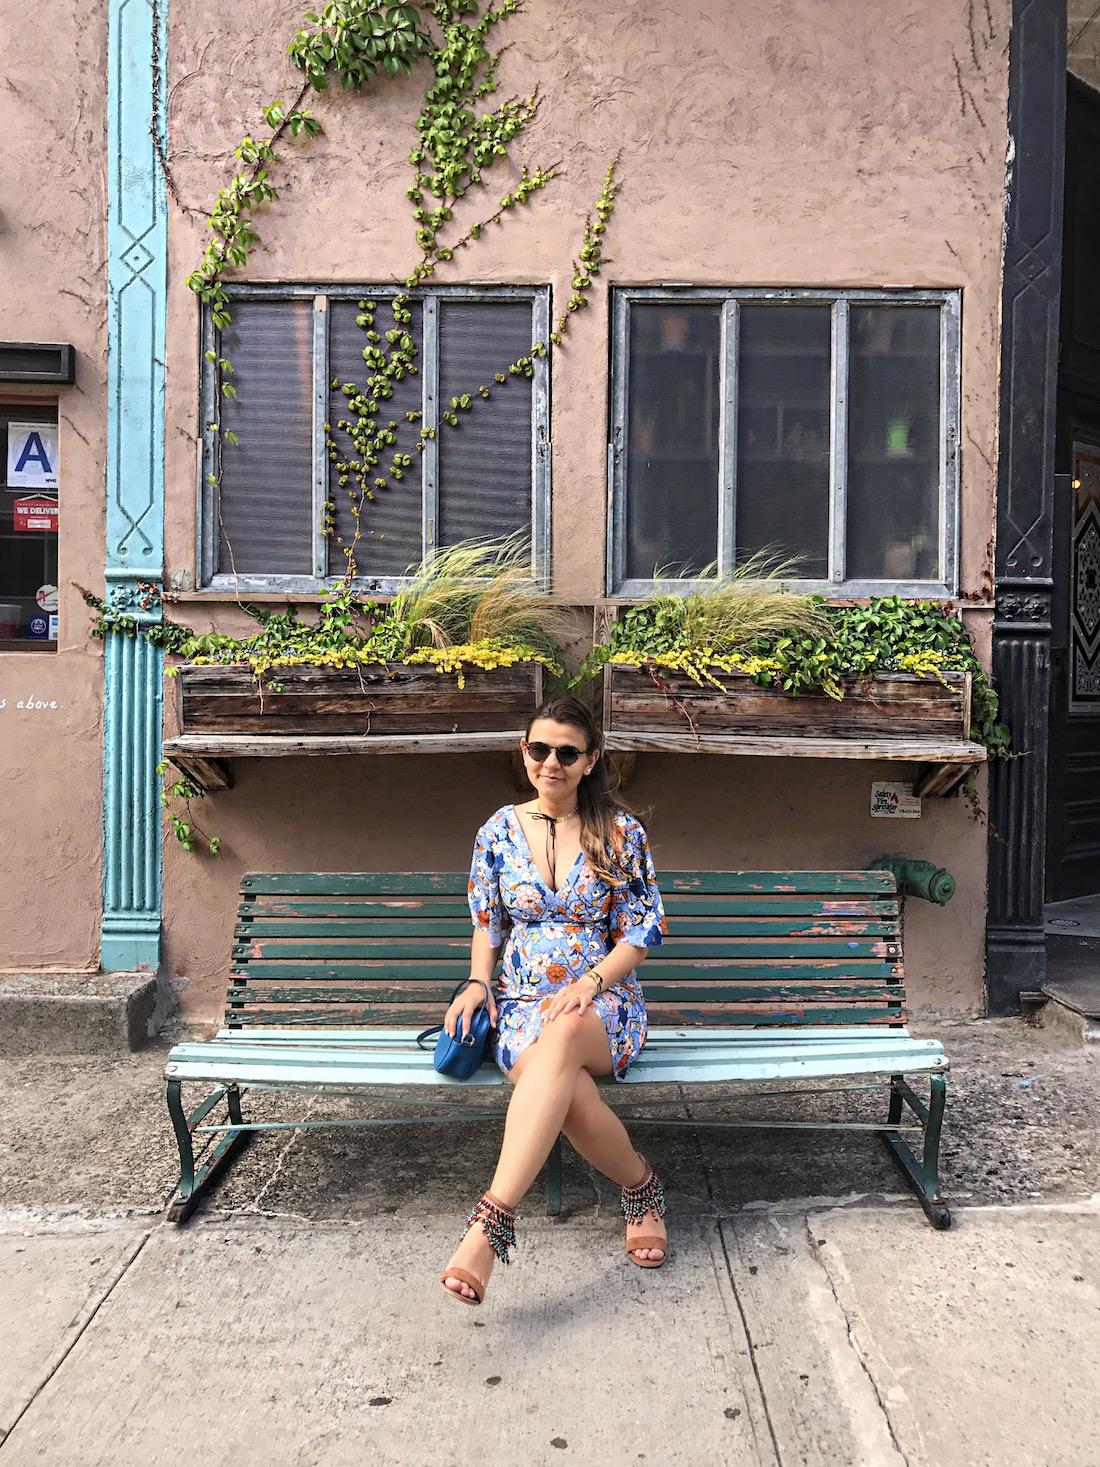 pregnancy-style-for-summer-floral-dress-zara-maternity-alley-girl-new-york-fashion-blog-5